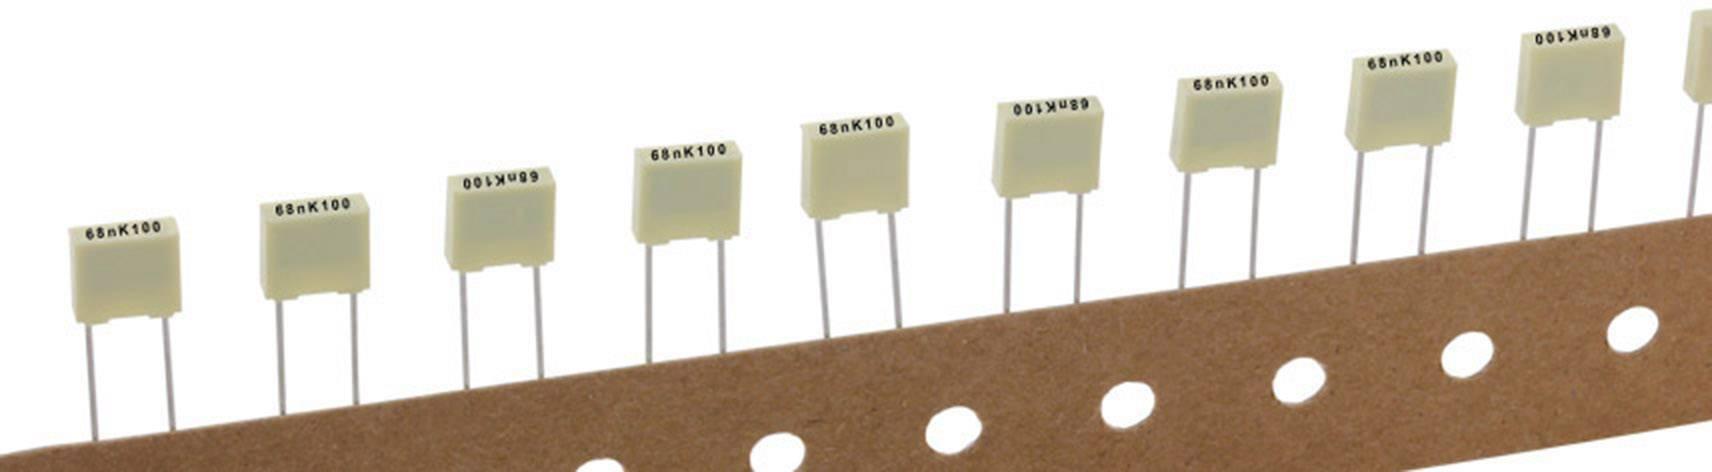 Polyesterový kondenzátor Kemet R82EC2470DQ60K+ radiální, 47 nF, 100 V,10 %, 5 mm, (d x š x v) 7.2 x 2.5 mm x 6.5 mm, 1 ks